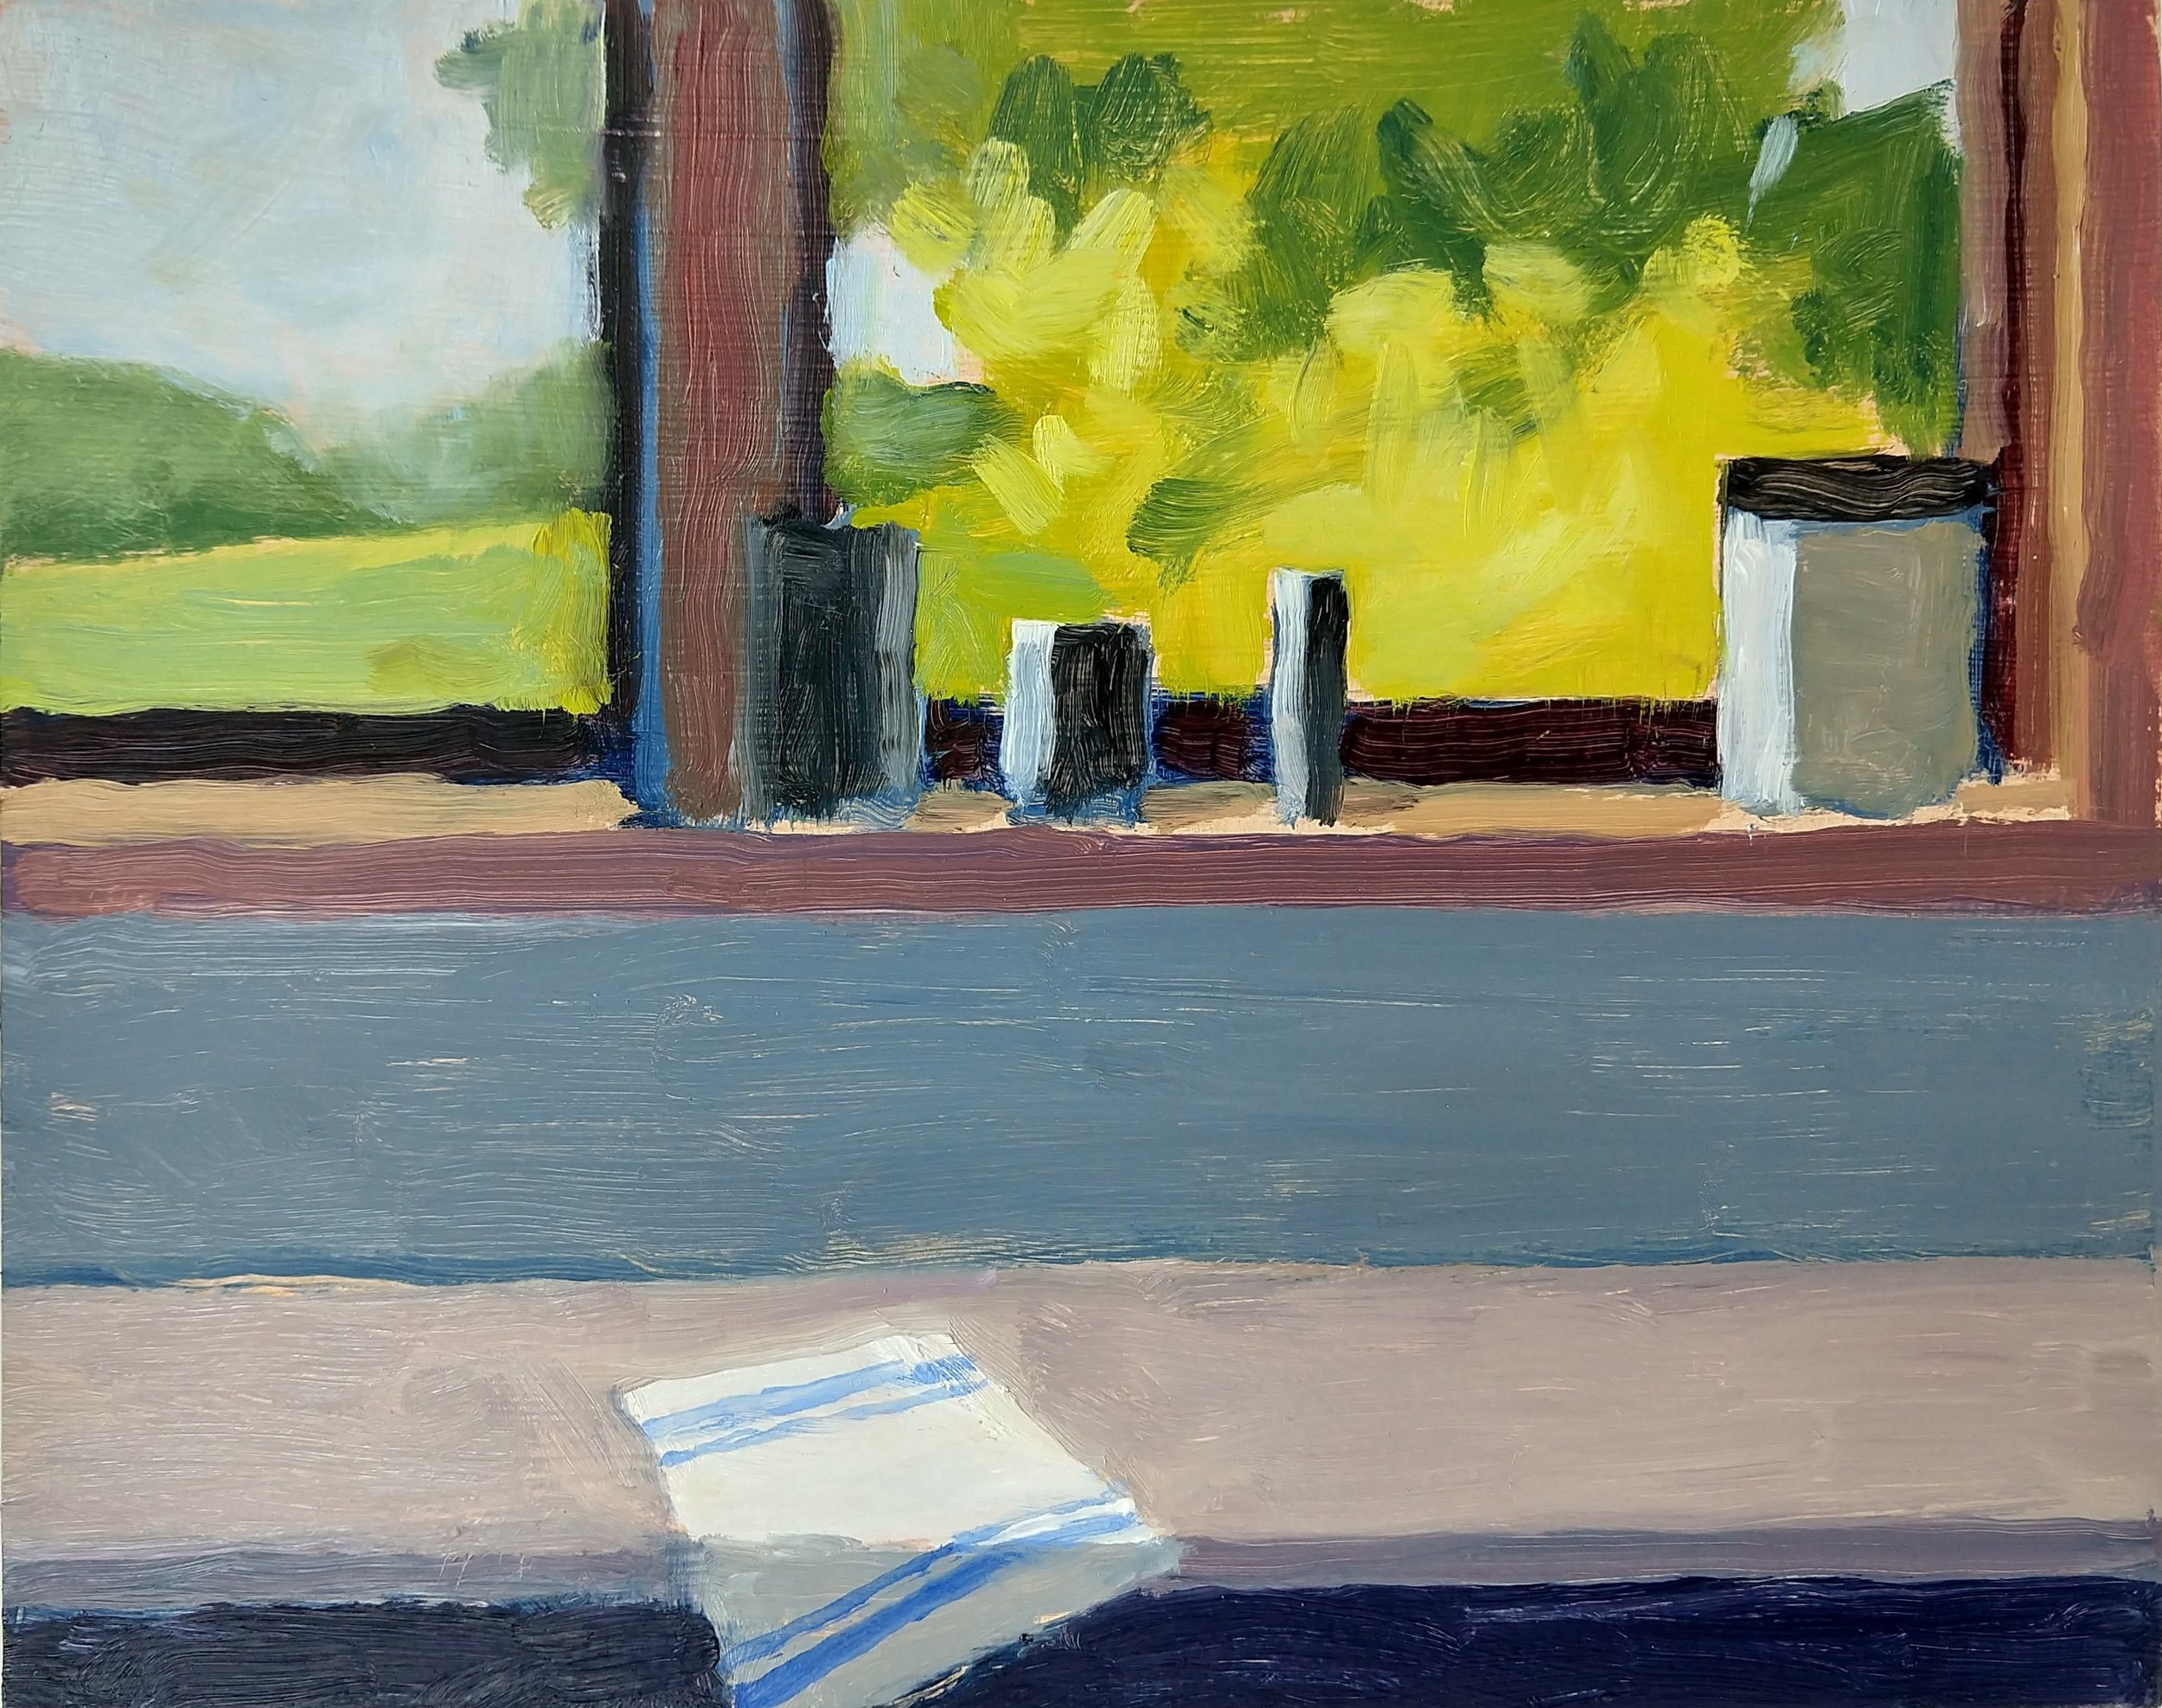 Kitchen Window, Robert Ross, 8x10 in, oil.jpg